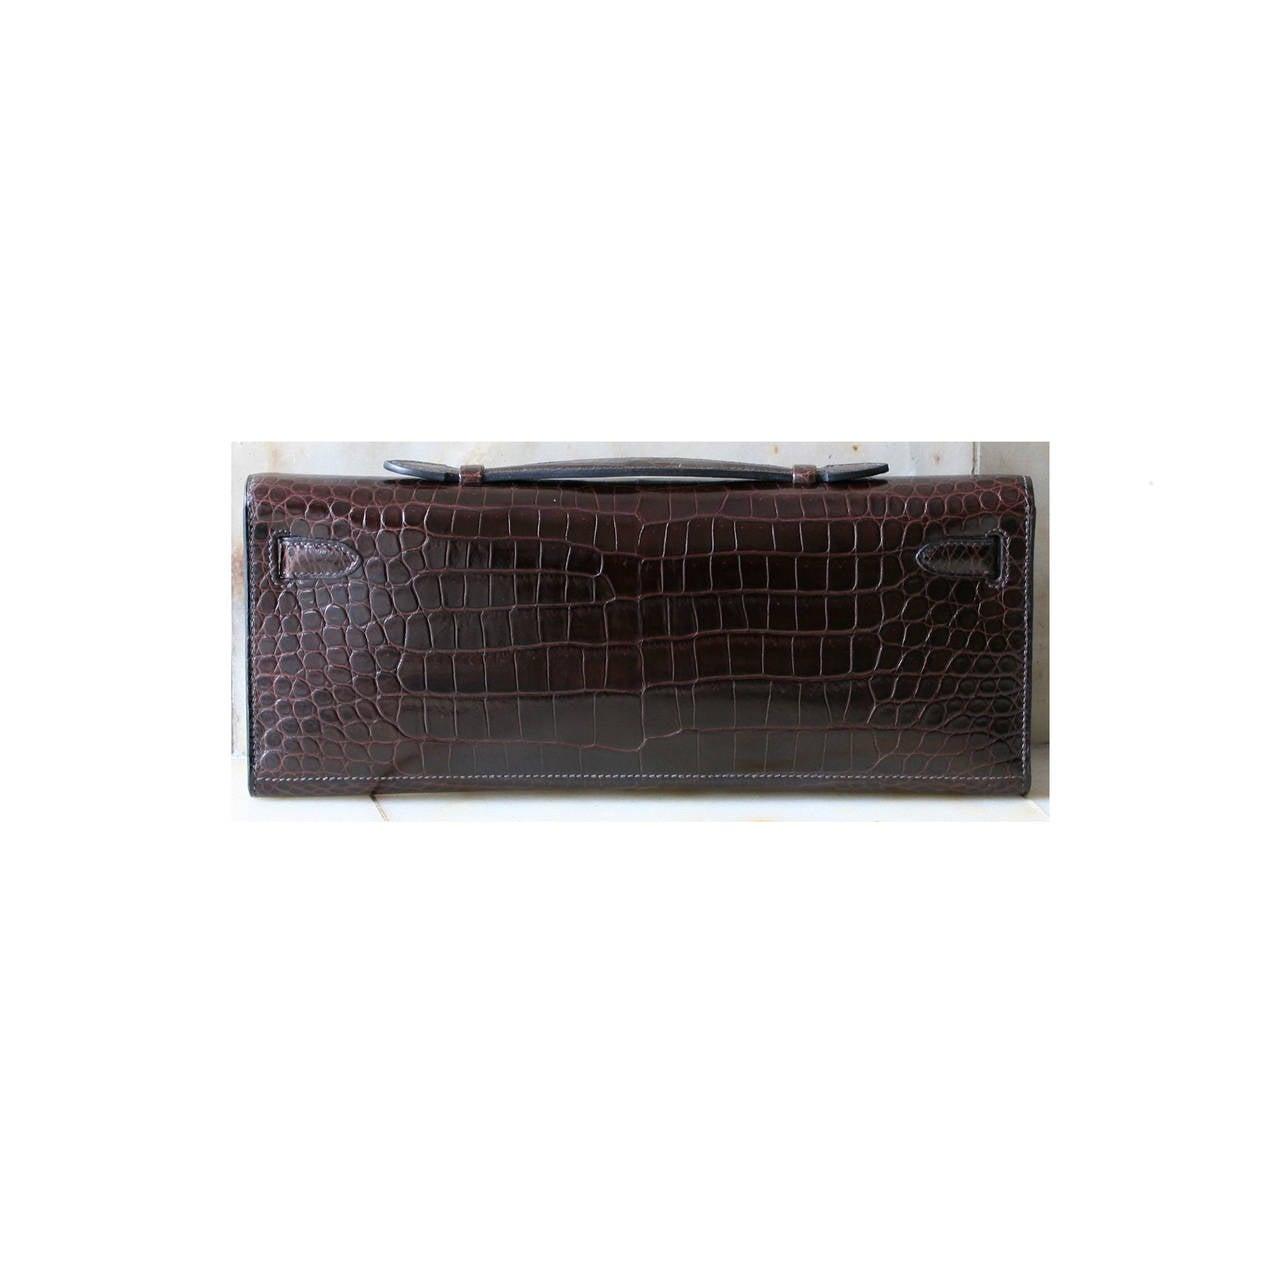 Hermes Black Crocodile/ Porosus Kelly Cut Clutch with Gold Hardware